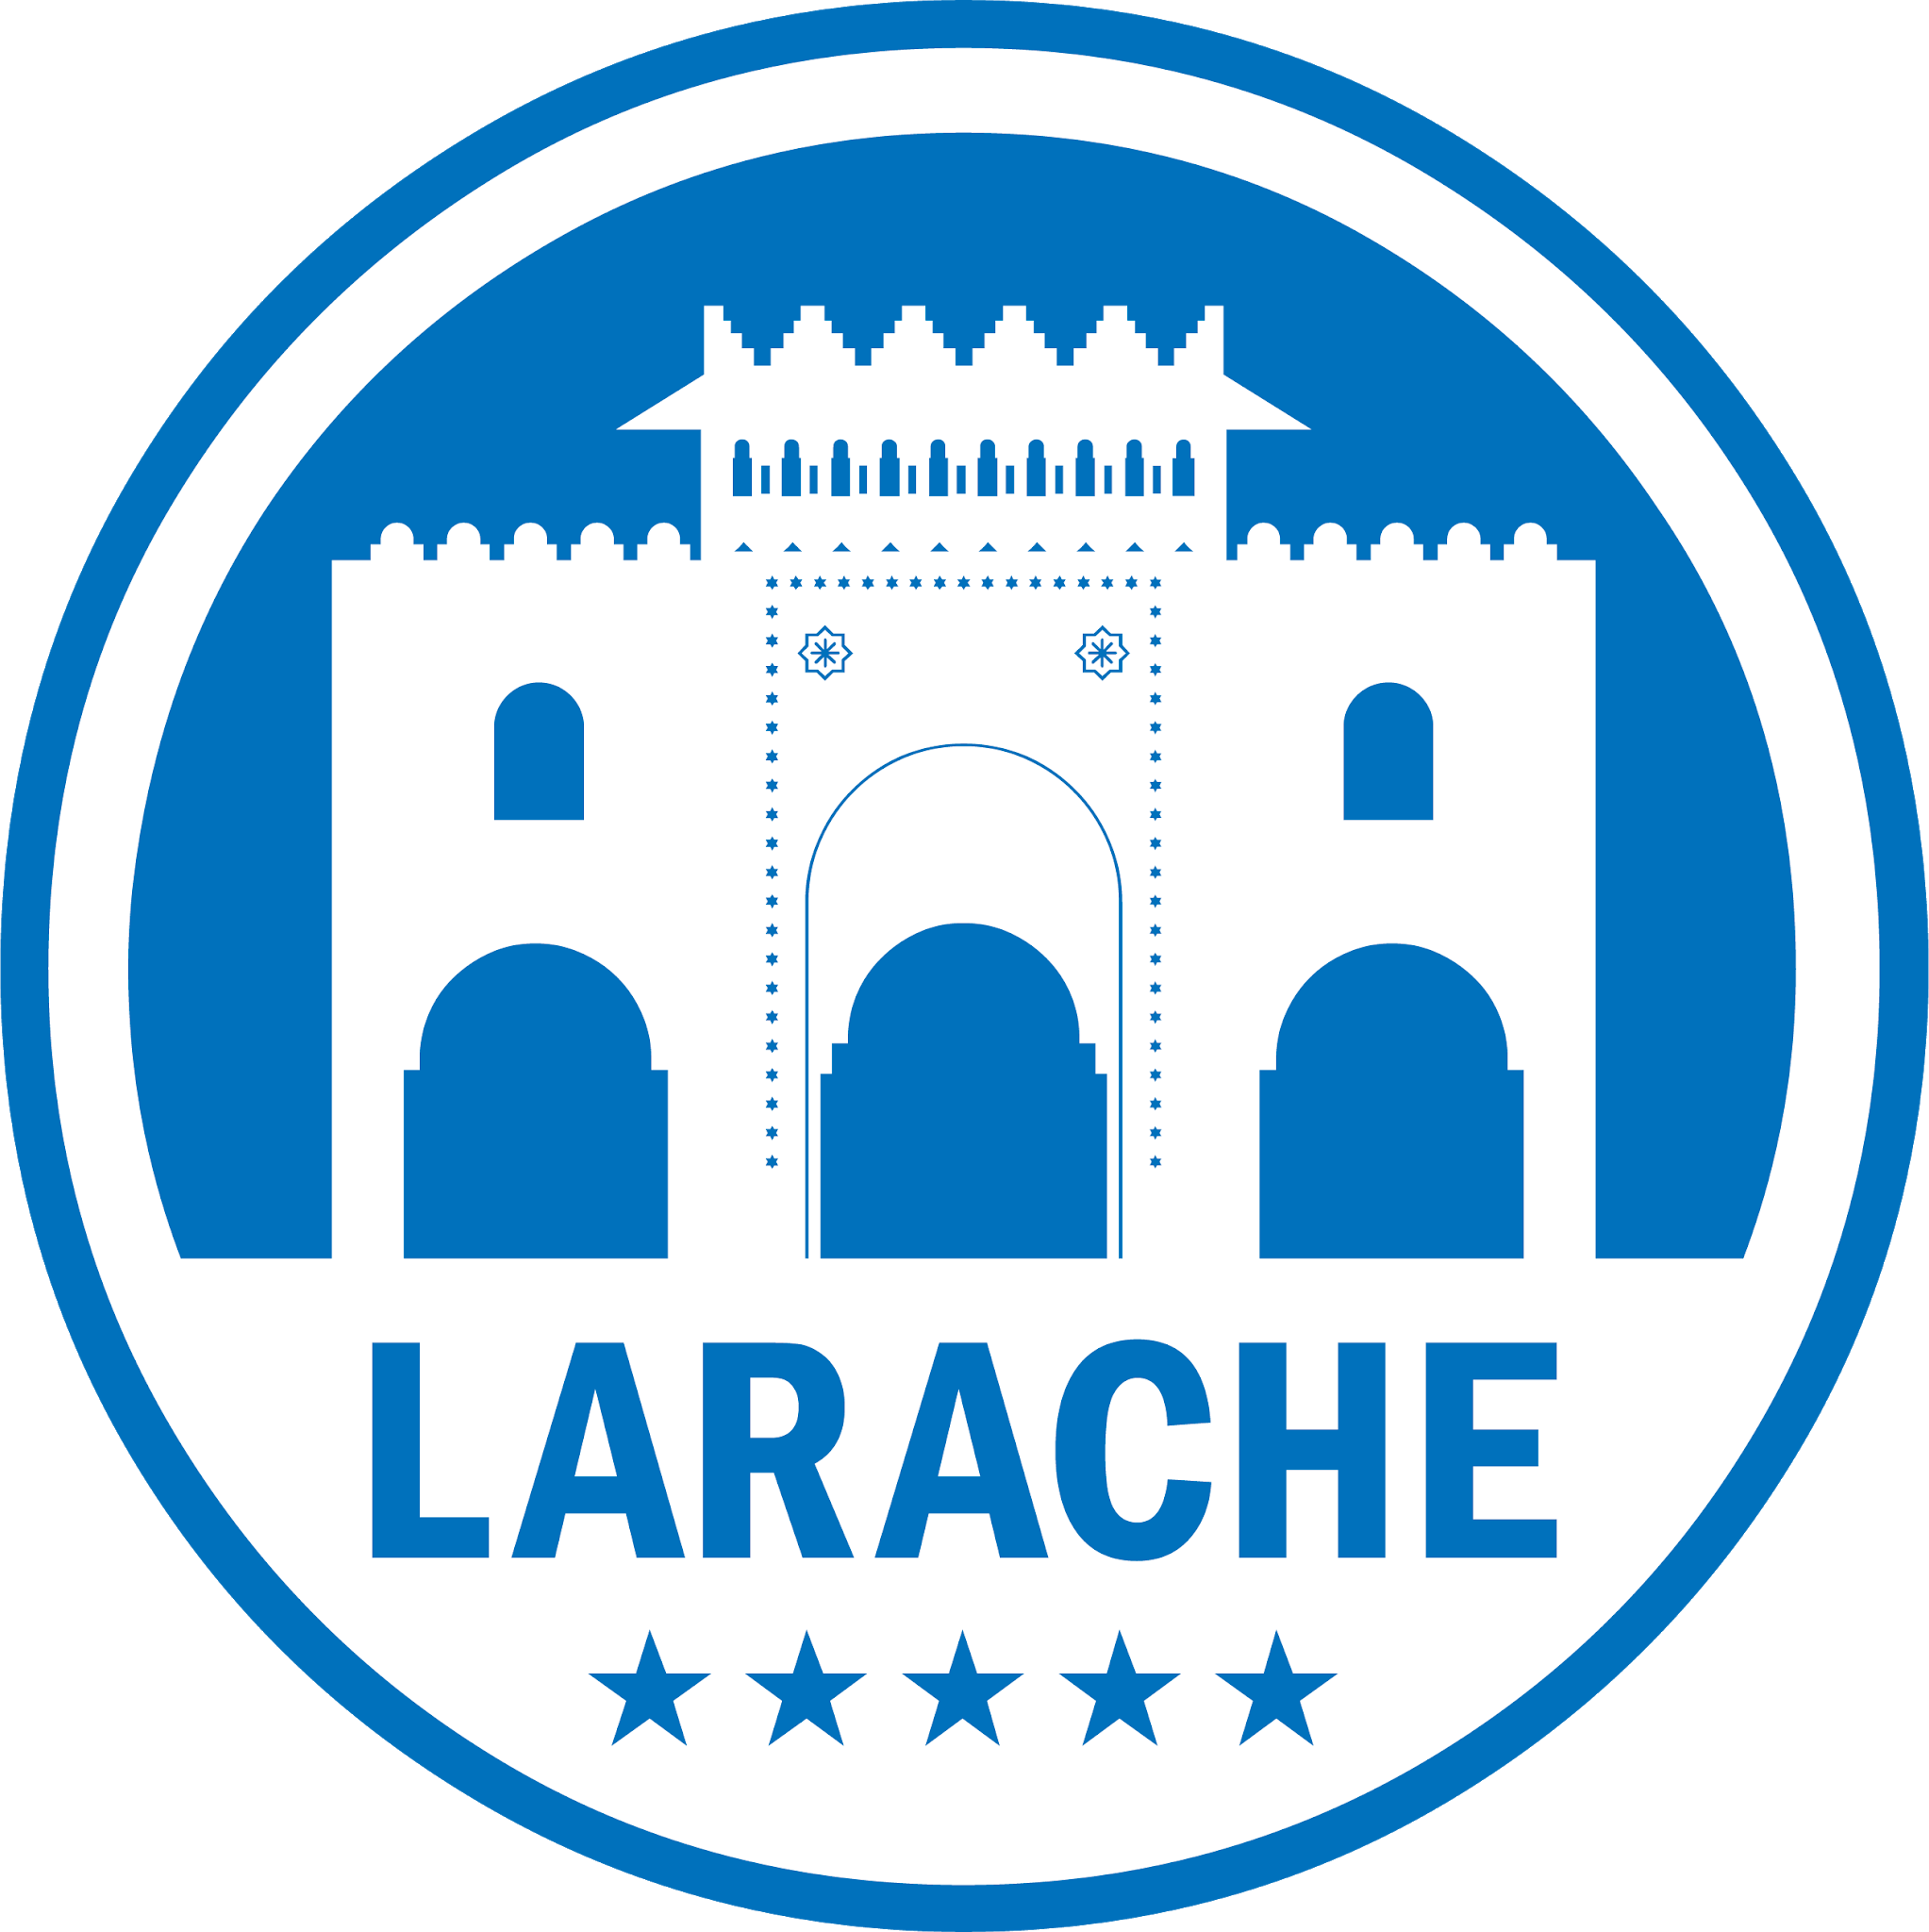 larache morocco logo svg eps png psd ai vector color free download #larache #logo #flag #svg #eps #morocco #vector #color #free #art #vectors #maroc